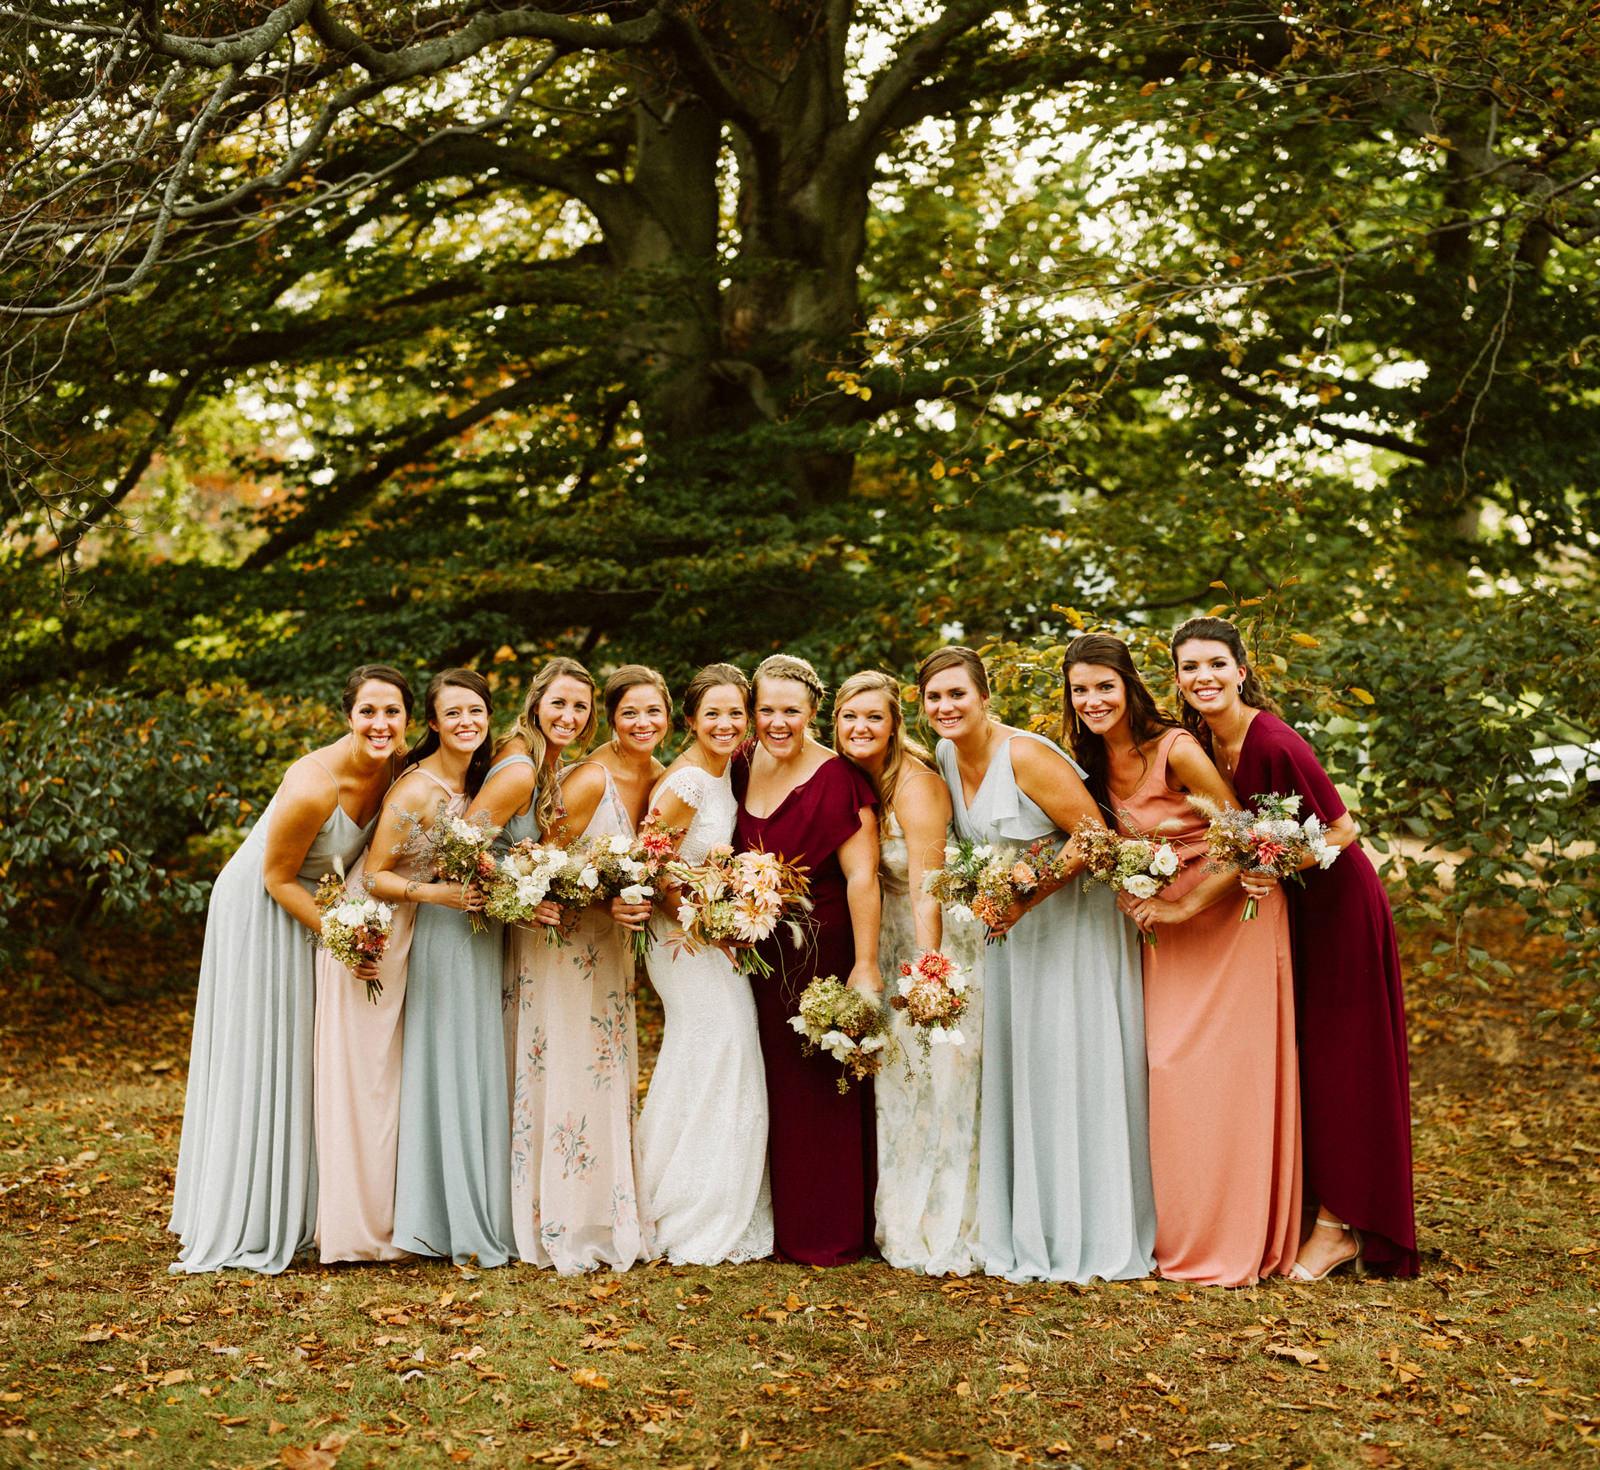 bridgeport-wedding-095 BRIDGEPORT, CONNECTICUT BACKYARD WEDDING